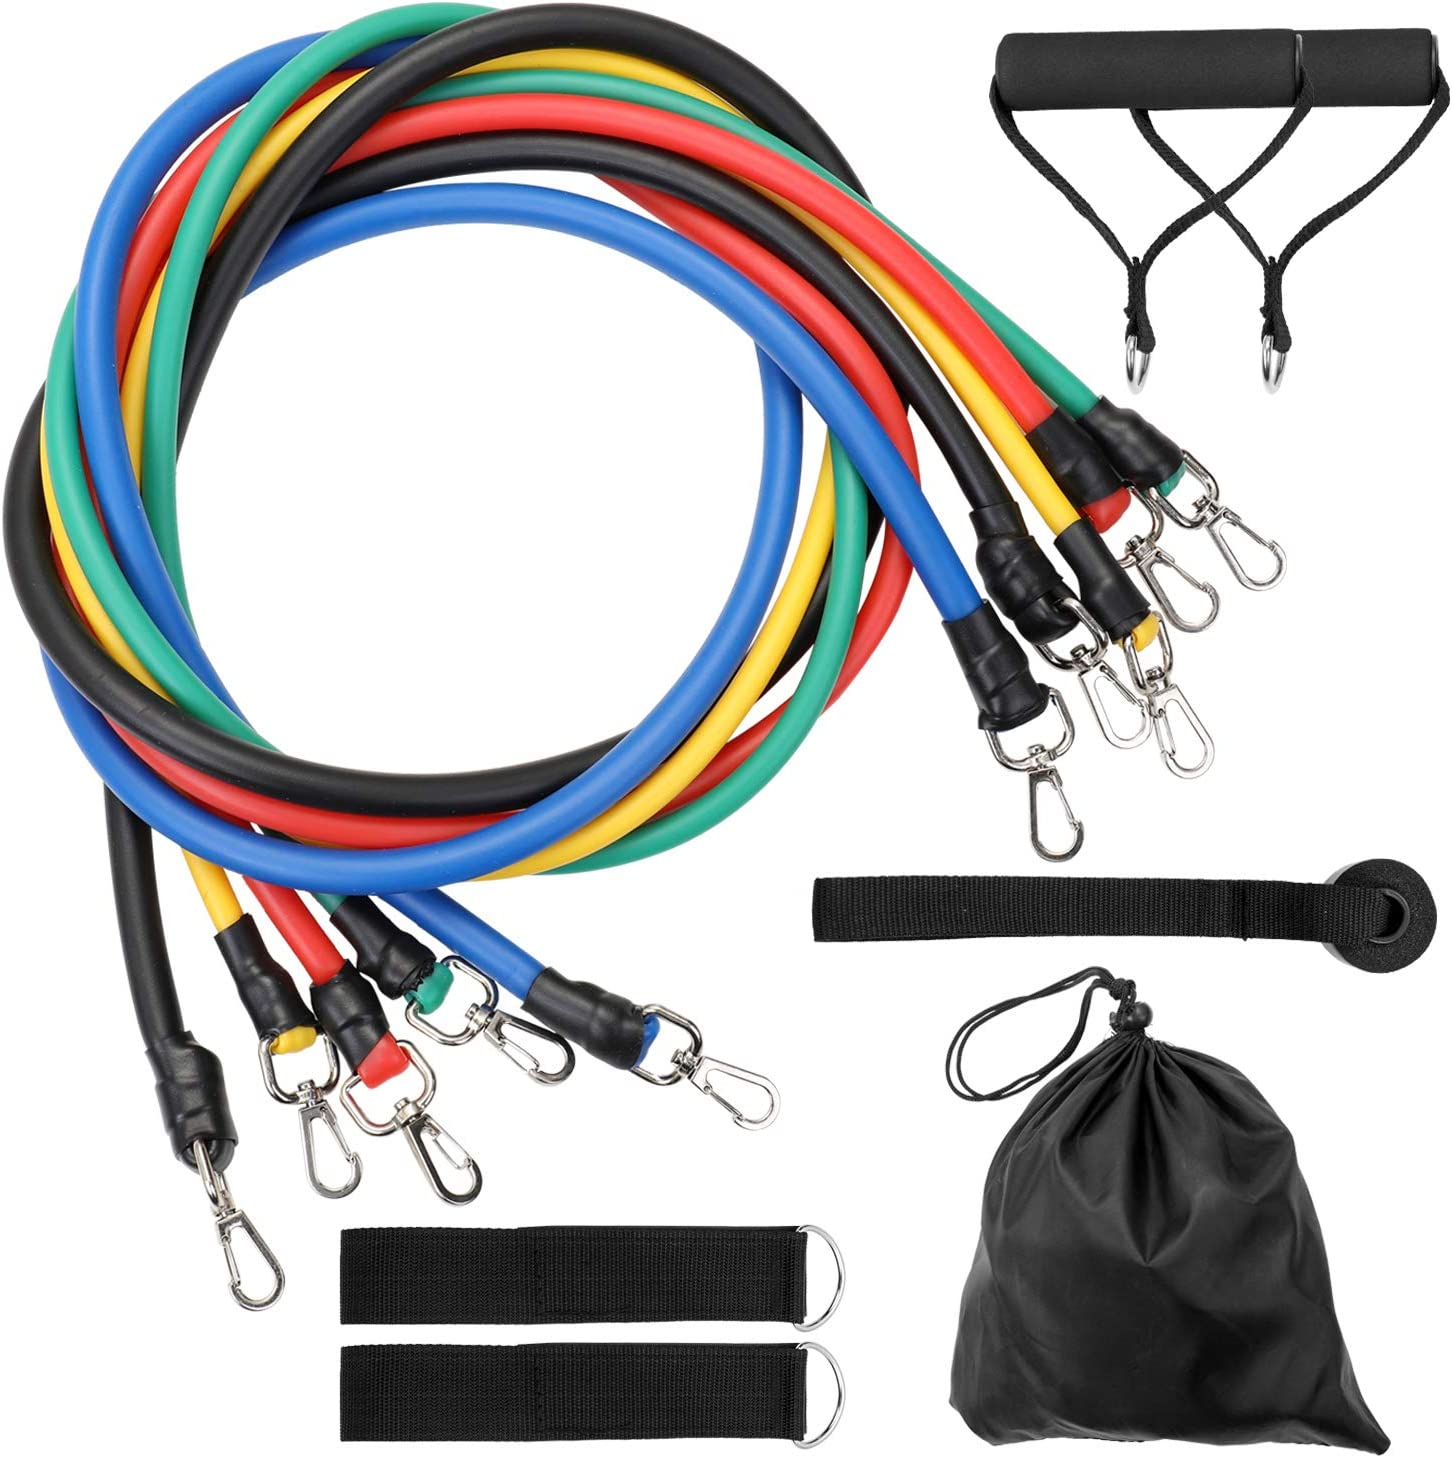 TOMSHOO Widerstandsband Klimmzüge Fitnessbänder Resistance Bands 15-125 lbs M8L4